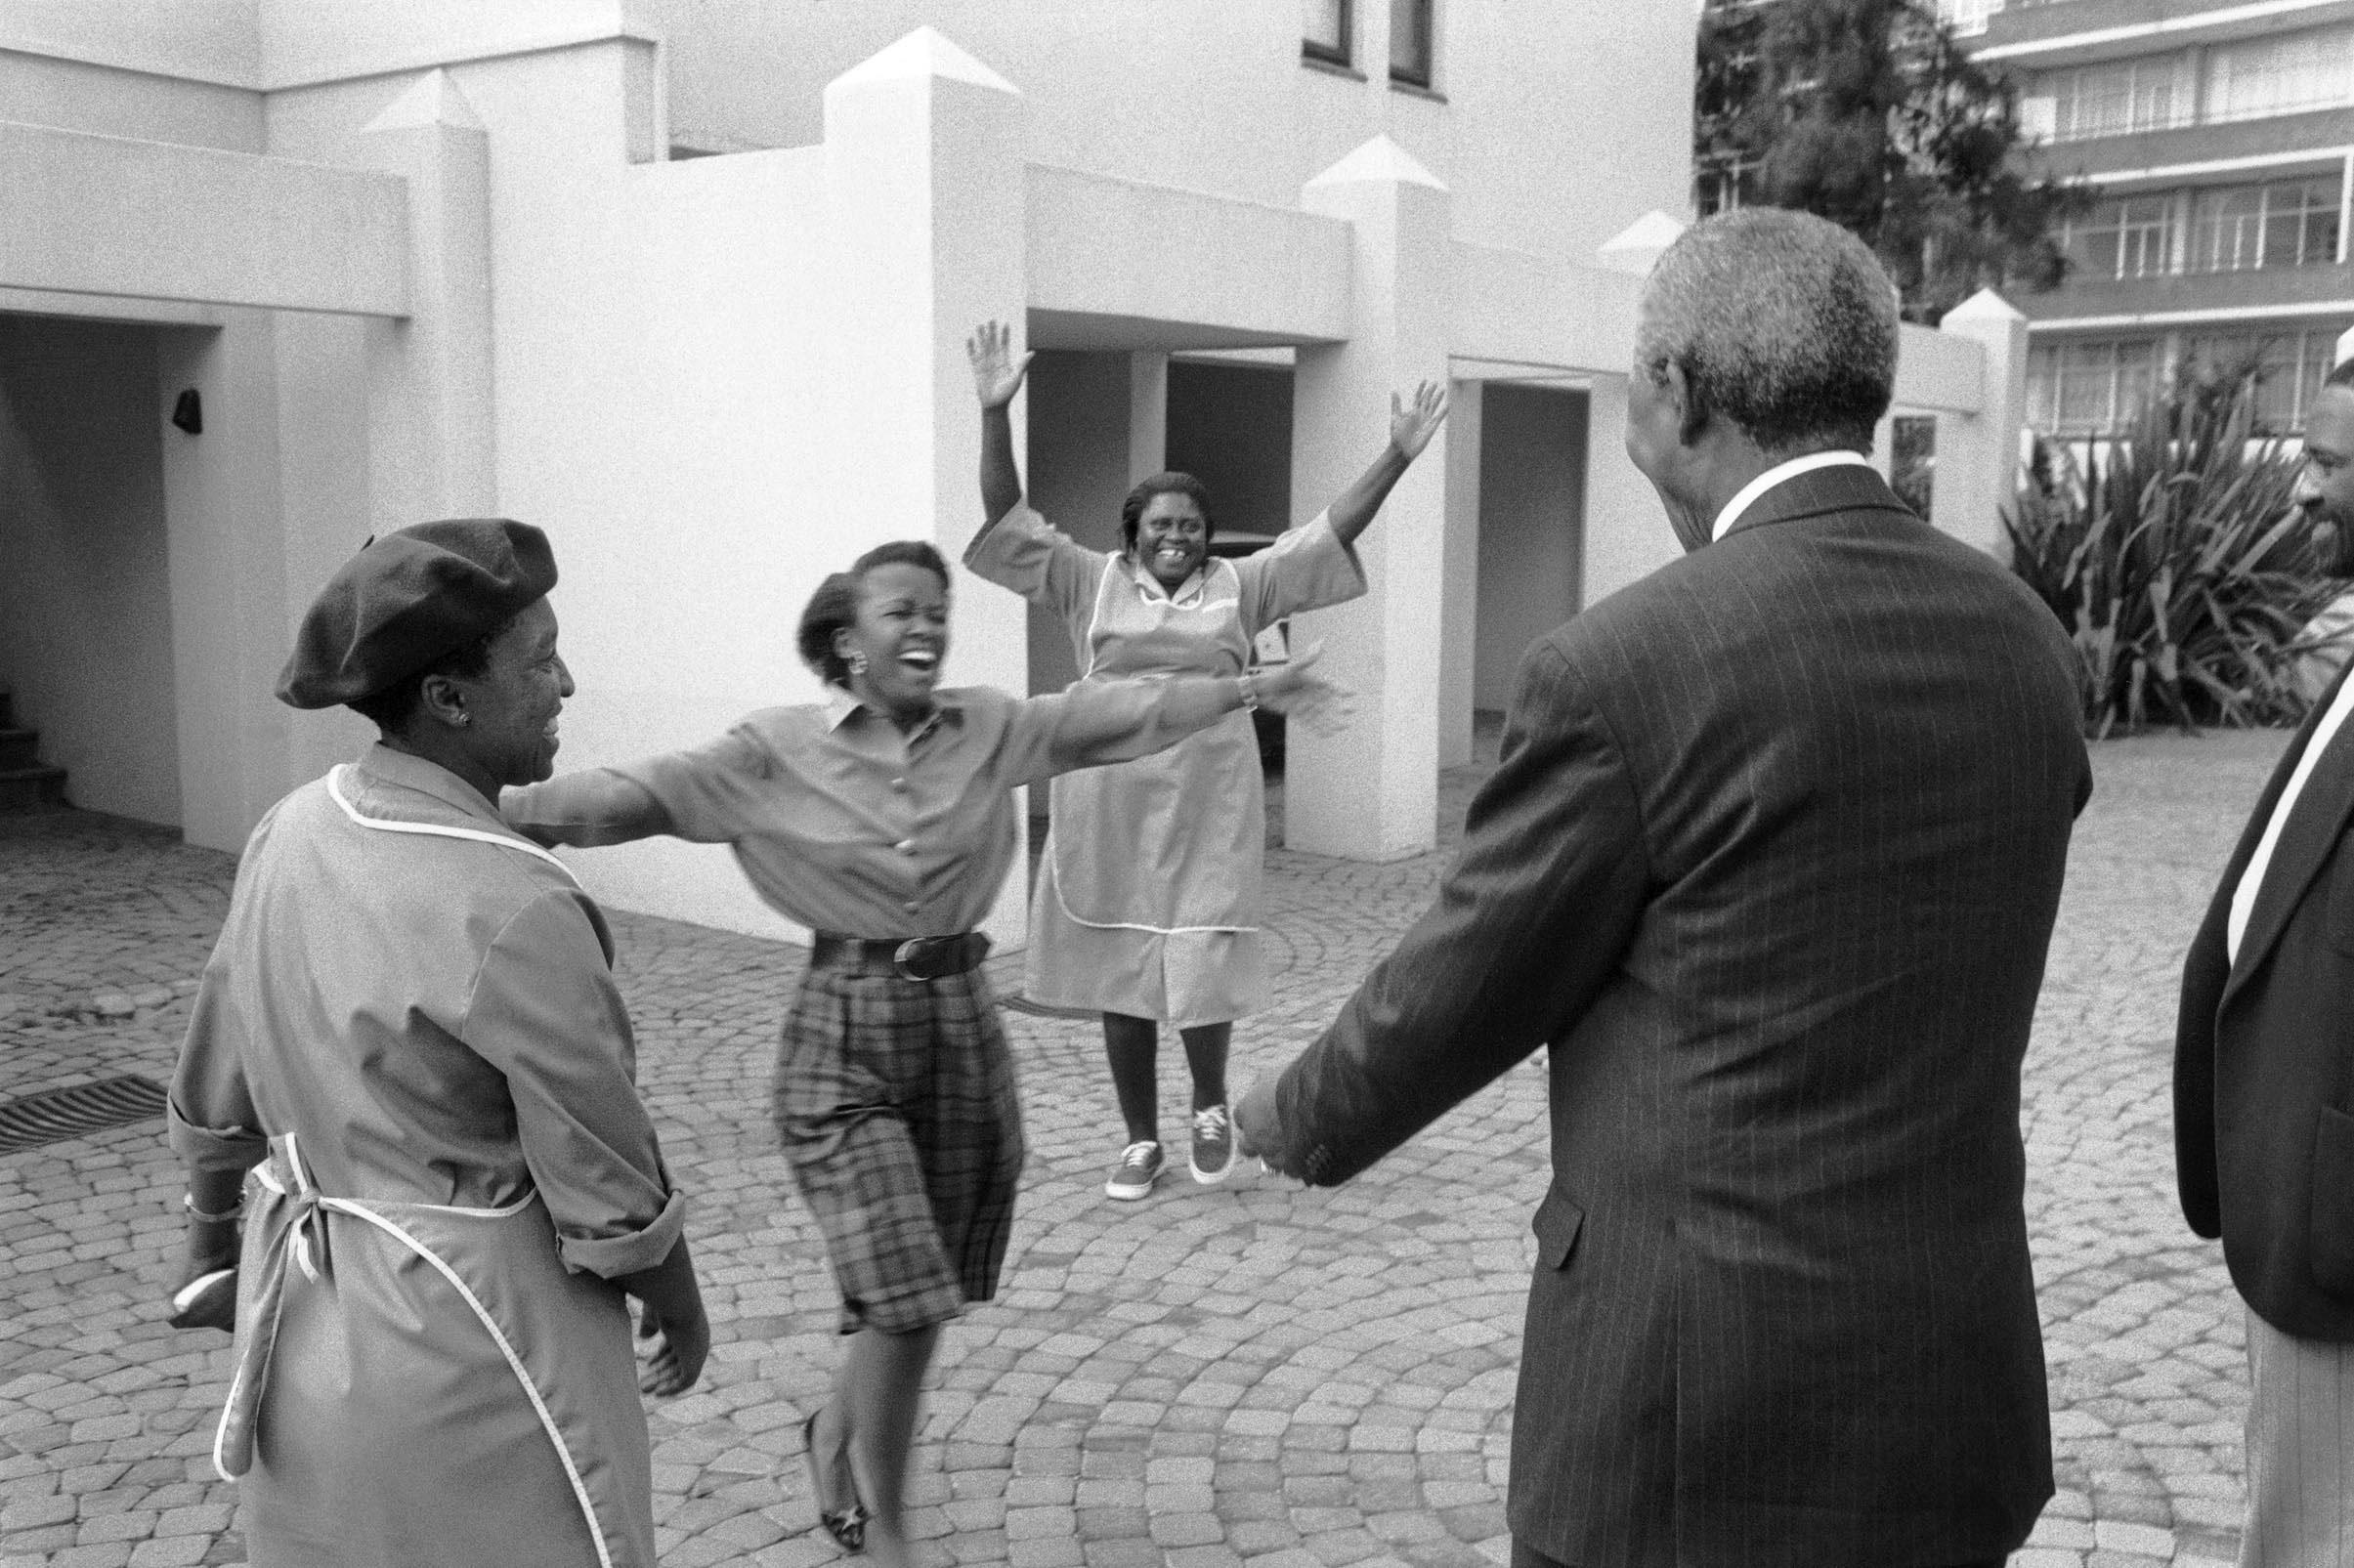 1994: First Encounter, a portrait of Nelson Mandela taken in Johannesburg. (Photograph by George Hallett)